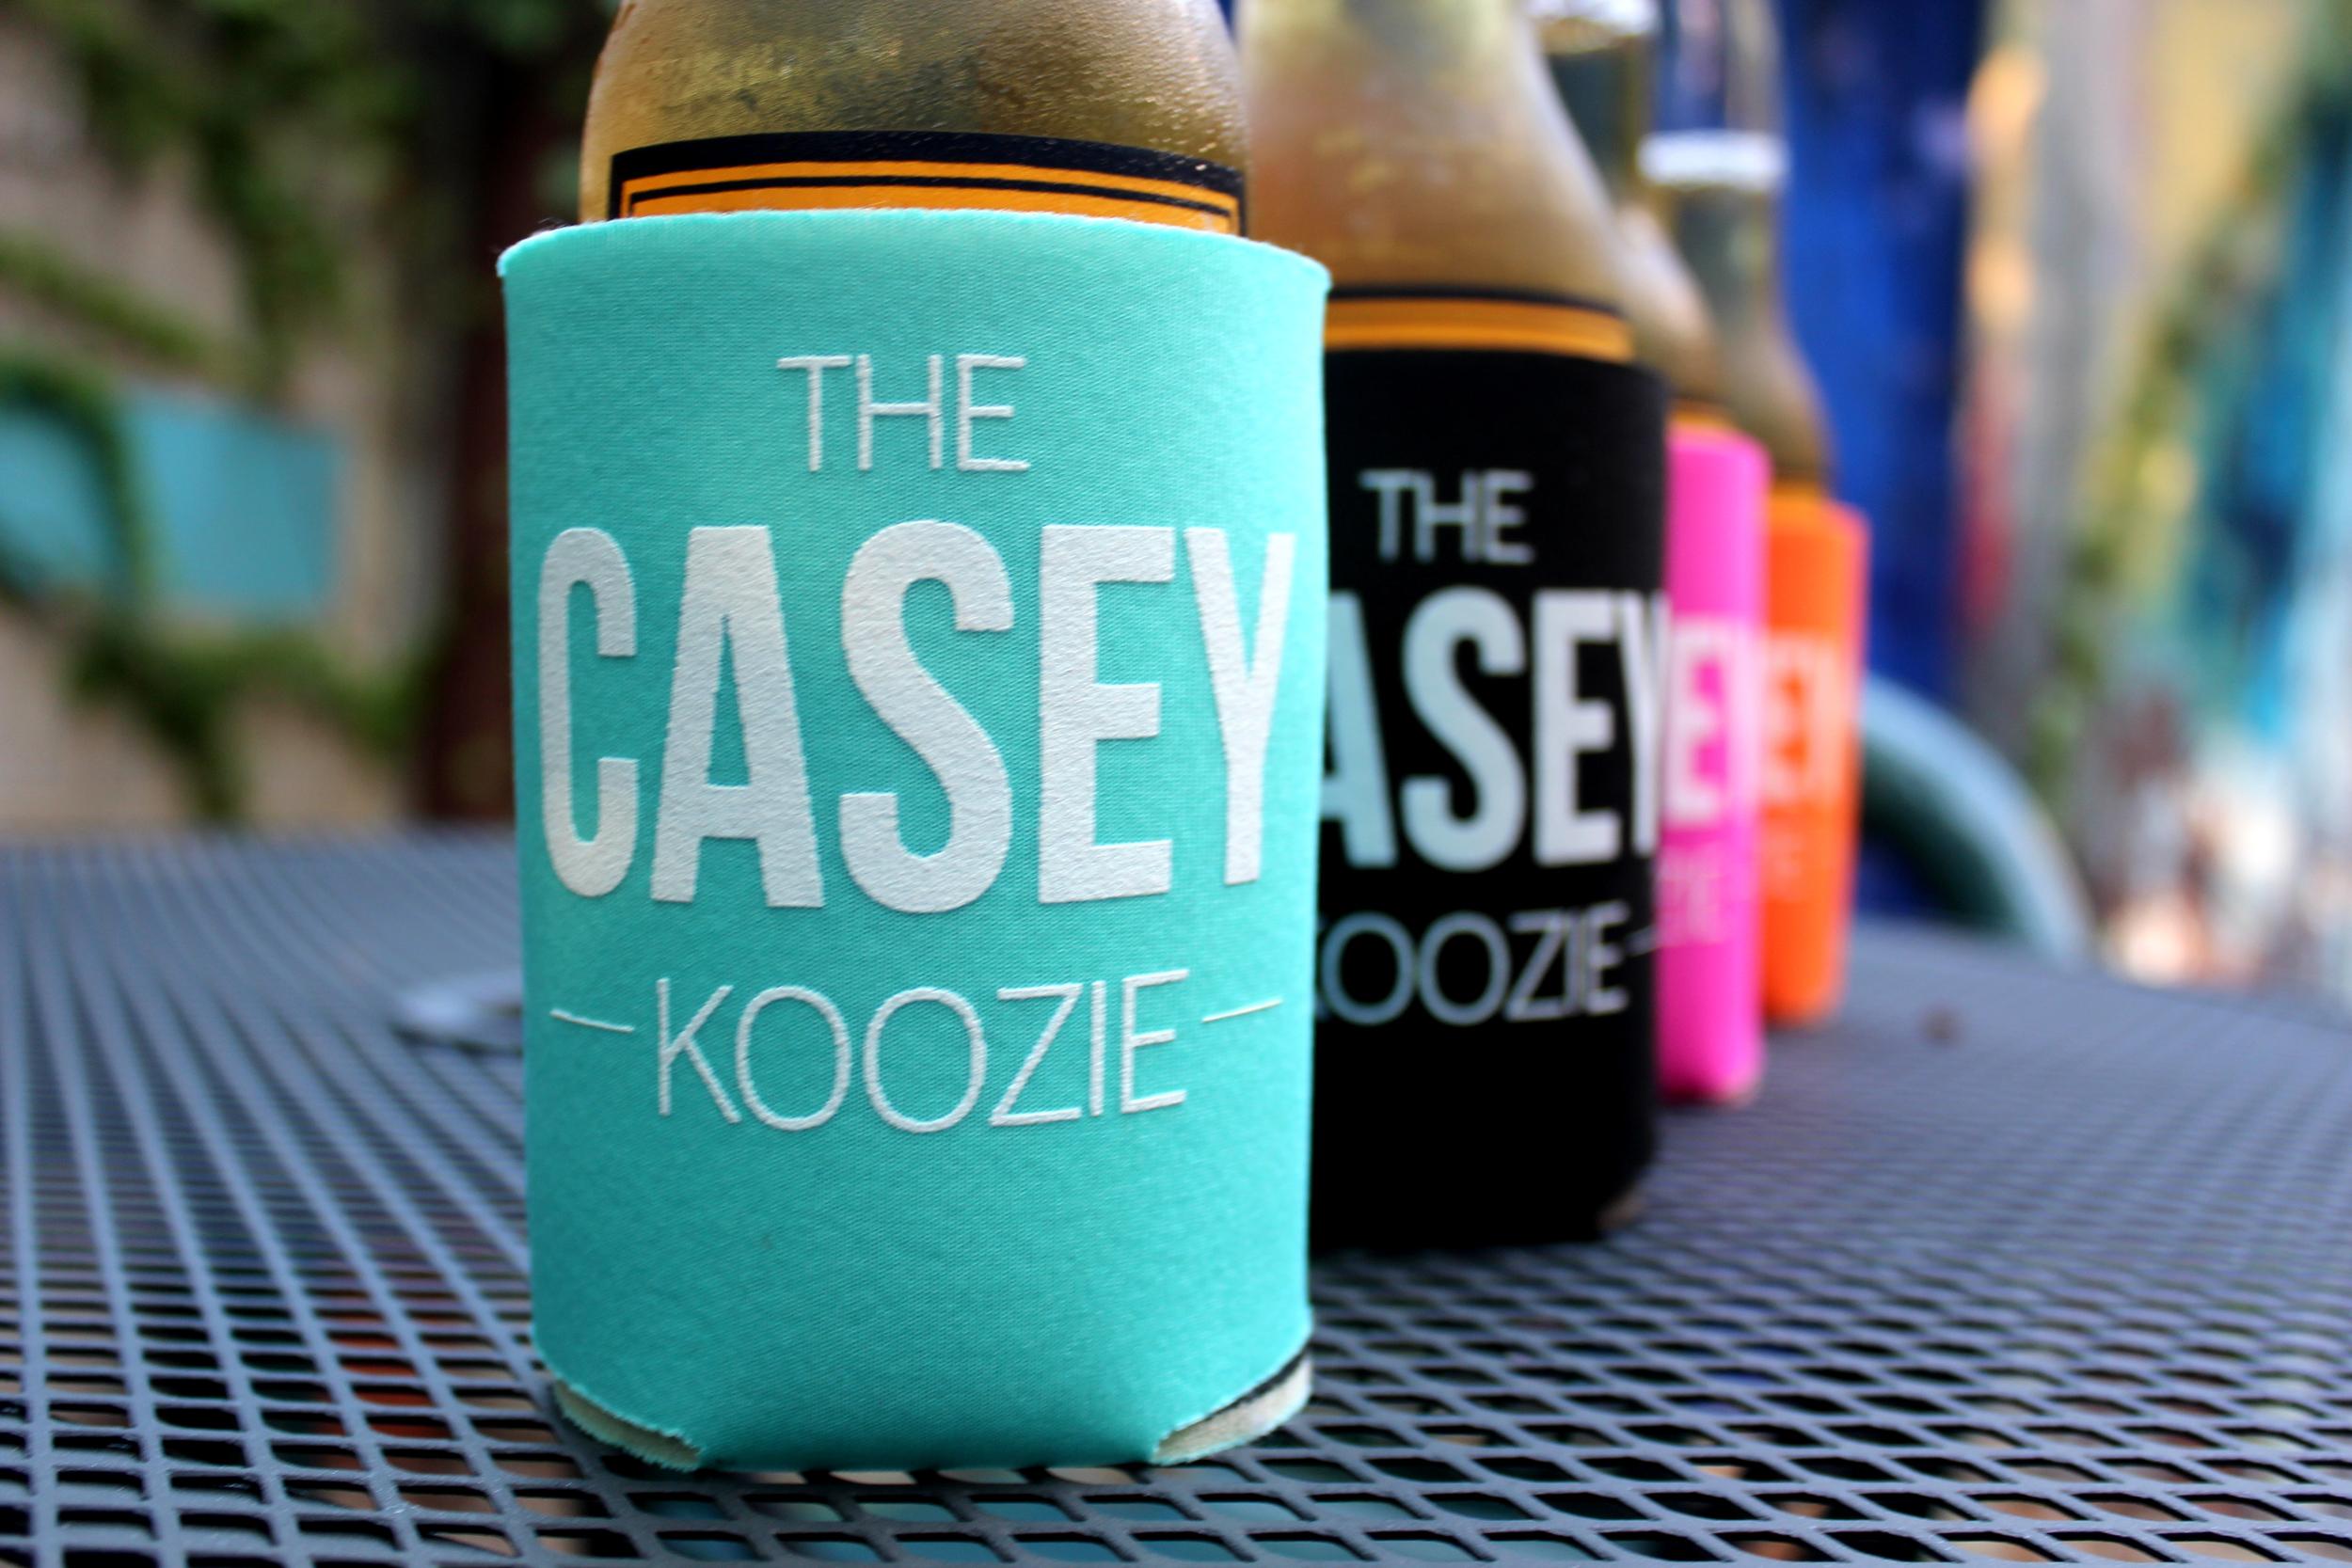 CaseyKoozieWeb5.jpg